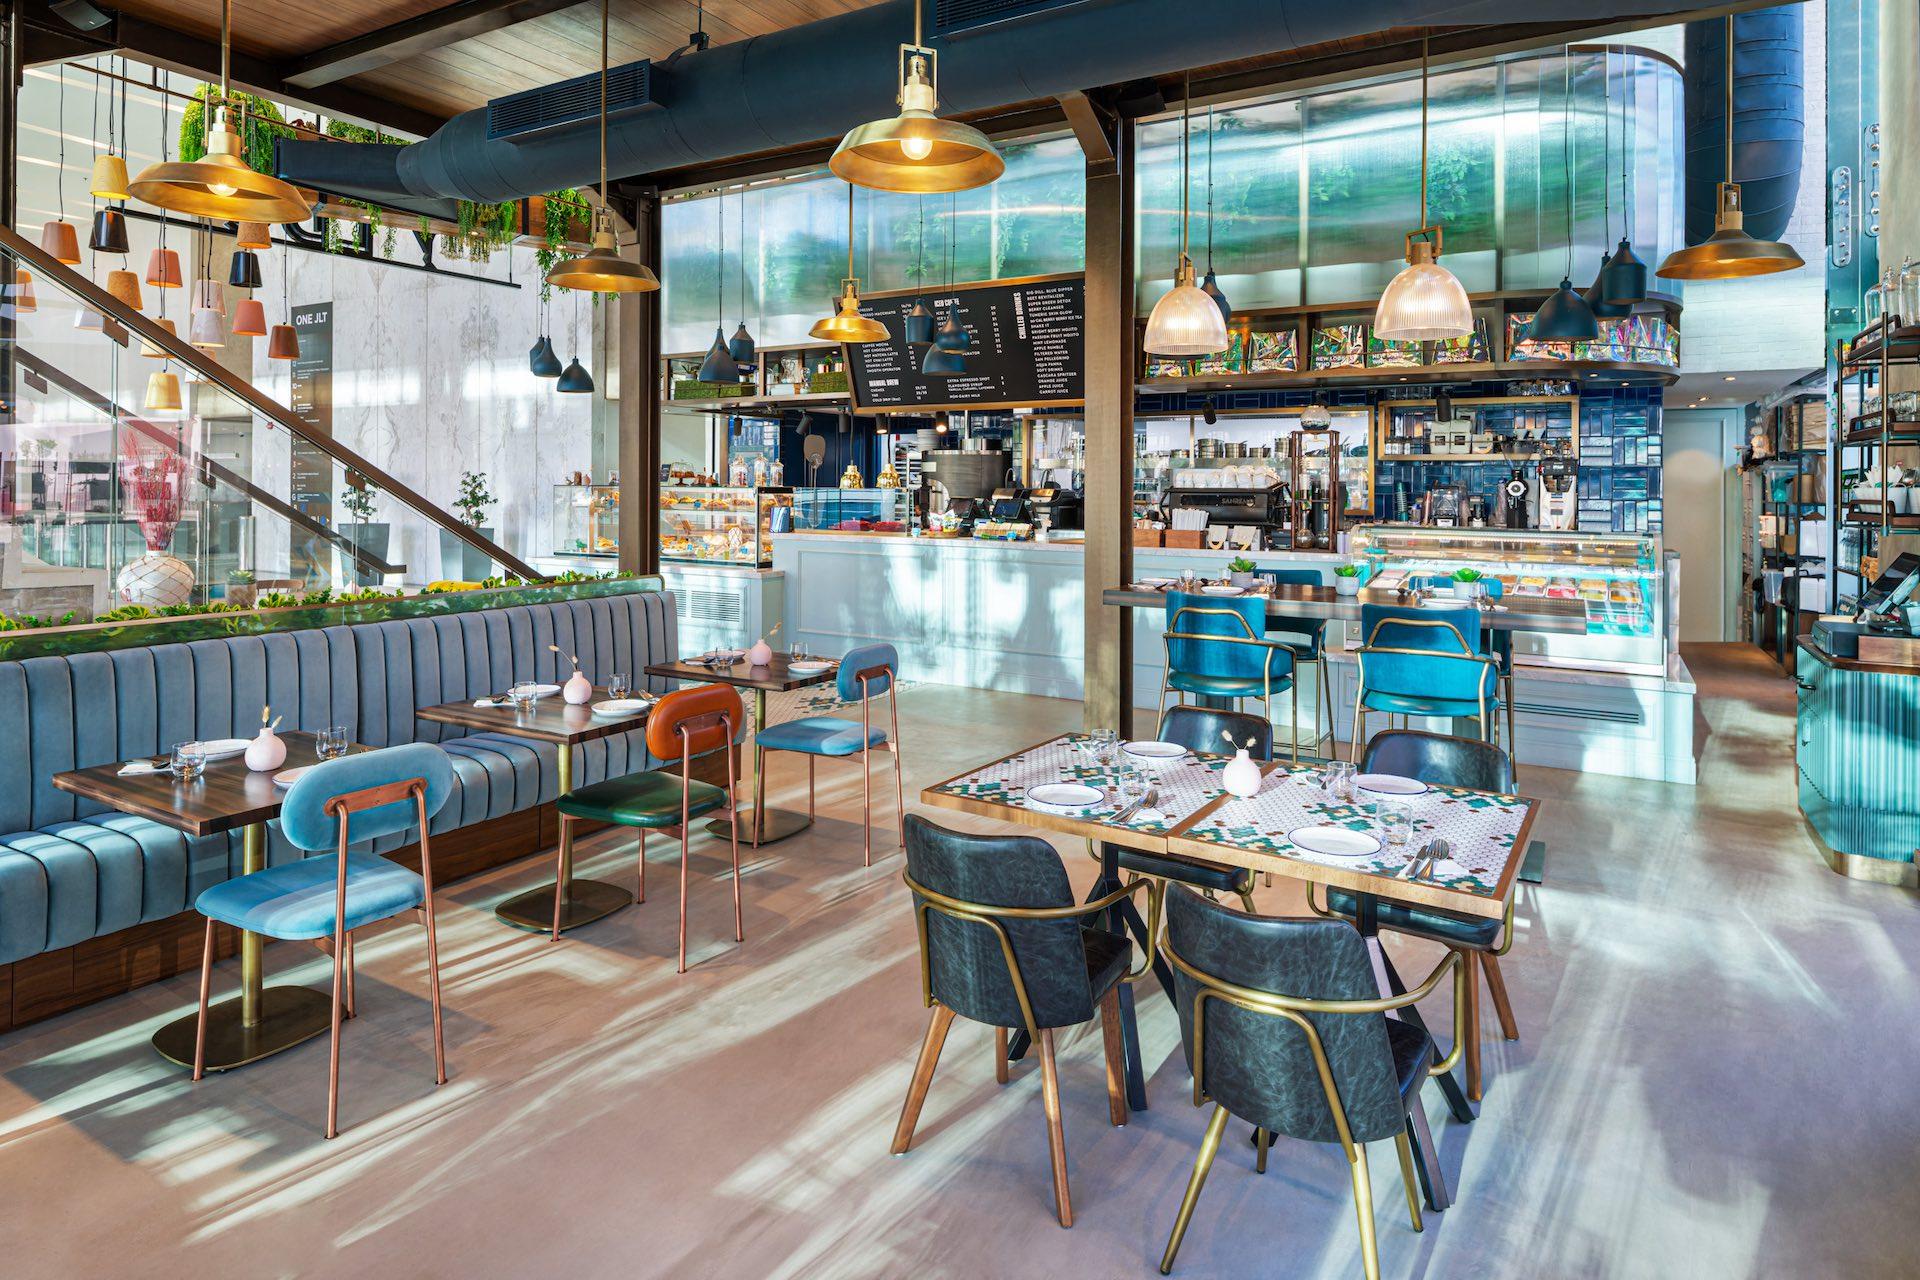 London Dairy Cafe | MUSE Design Awards